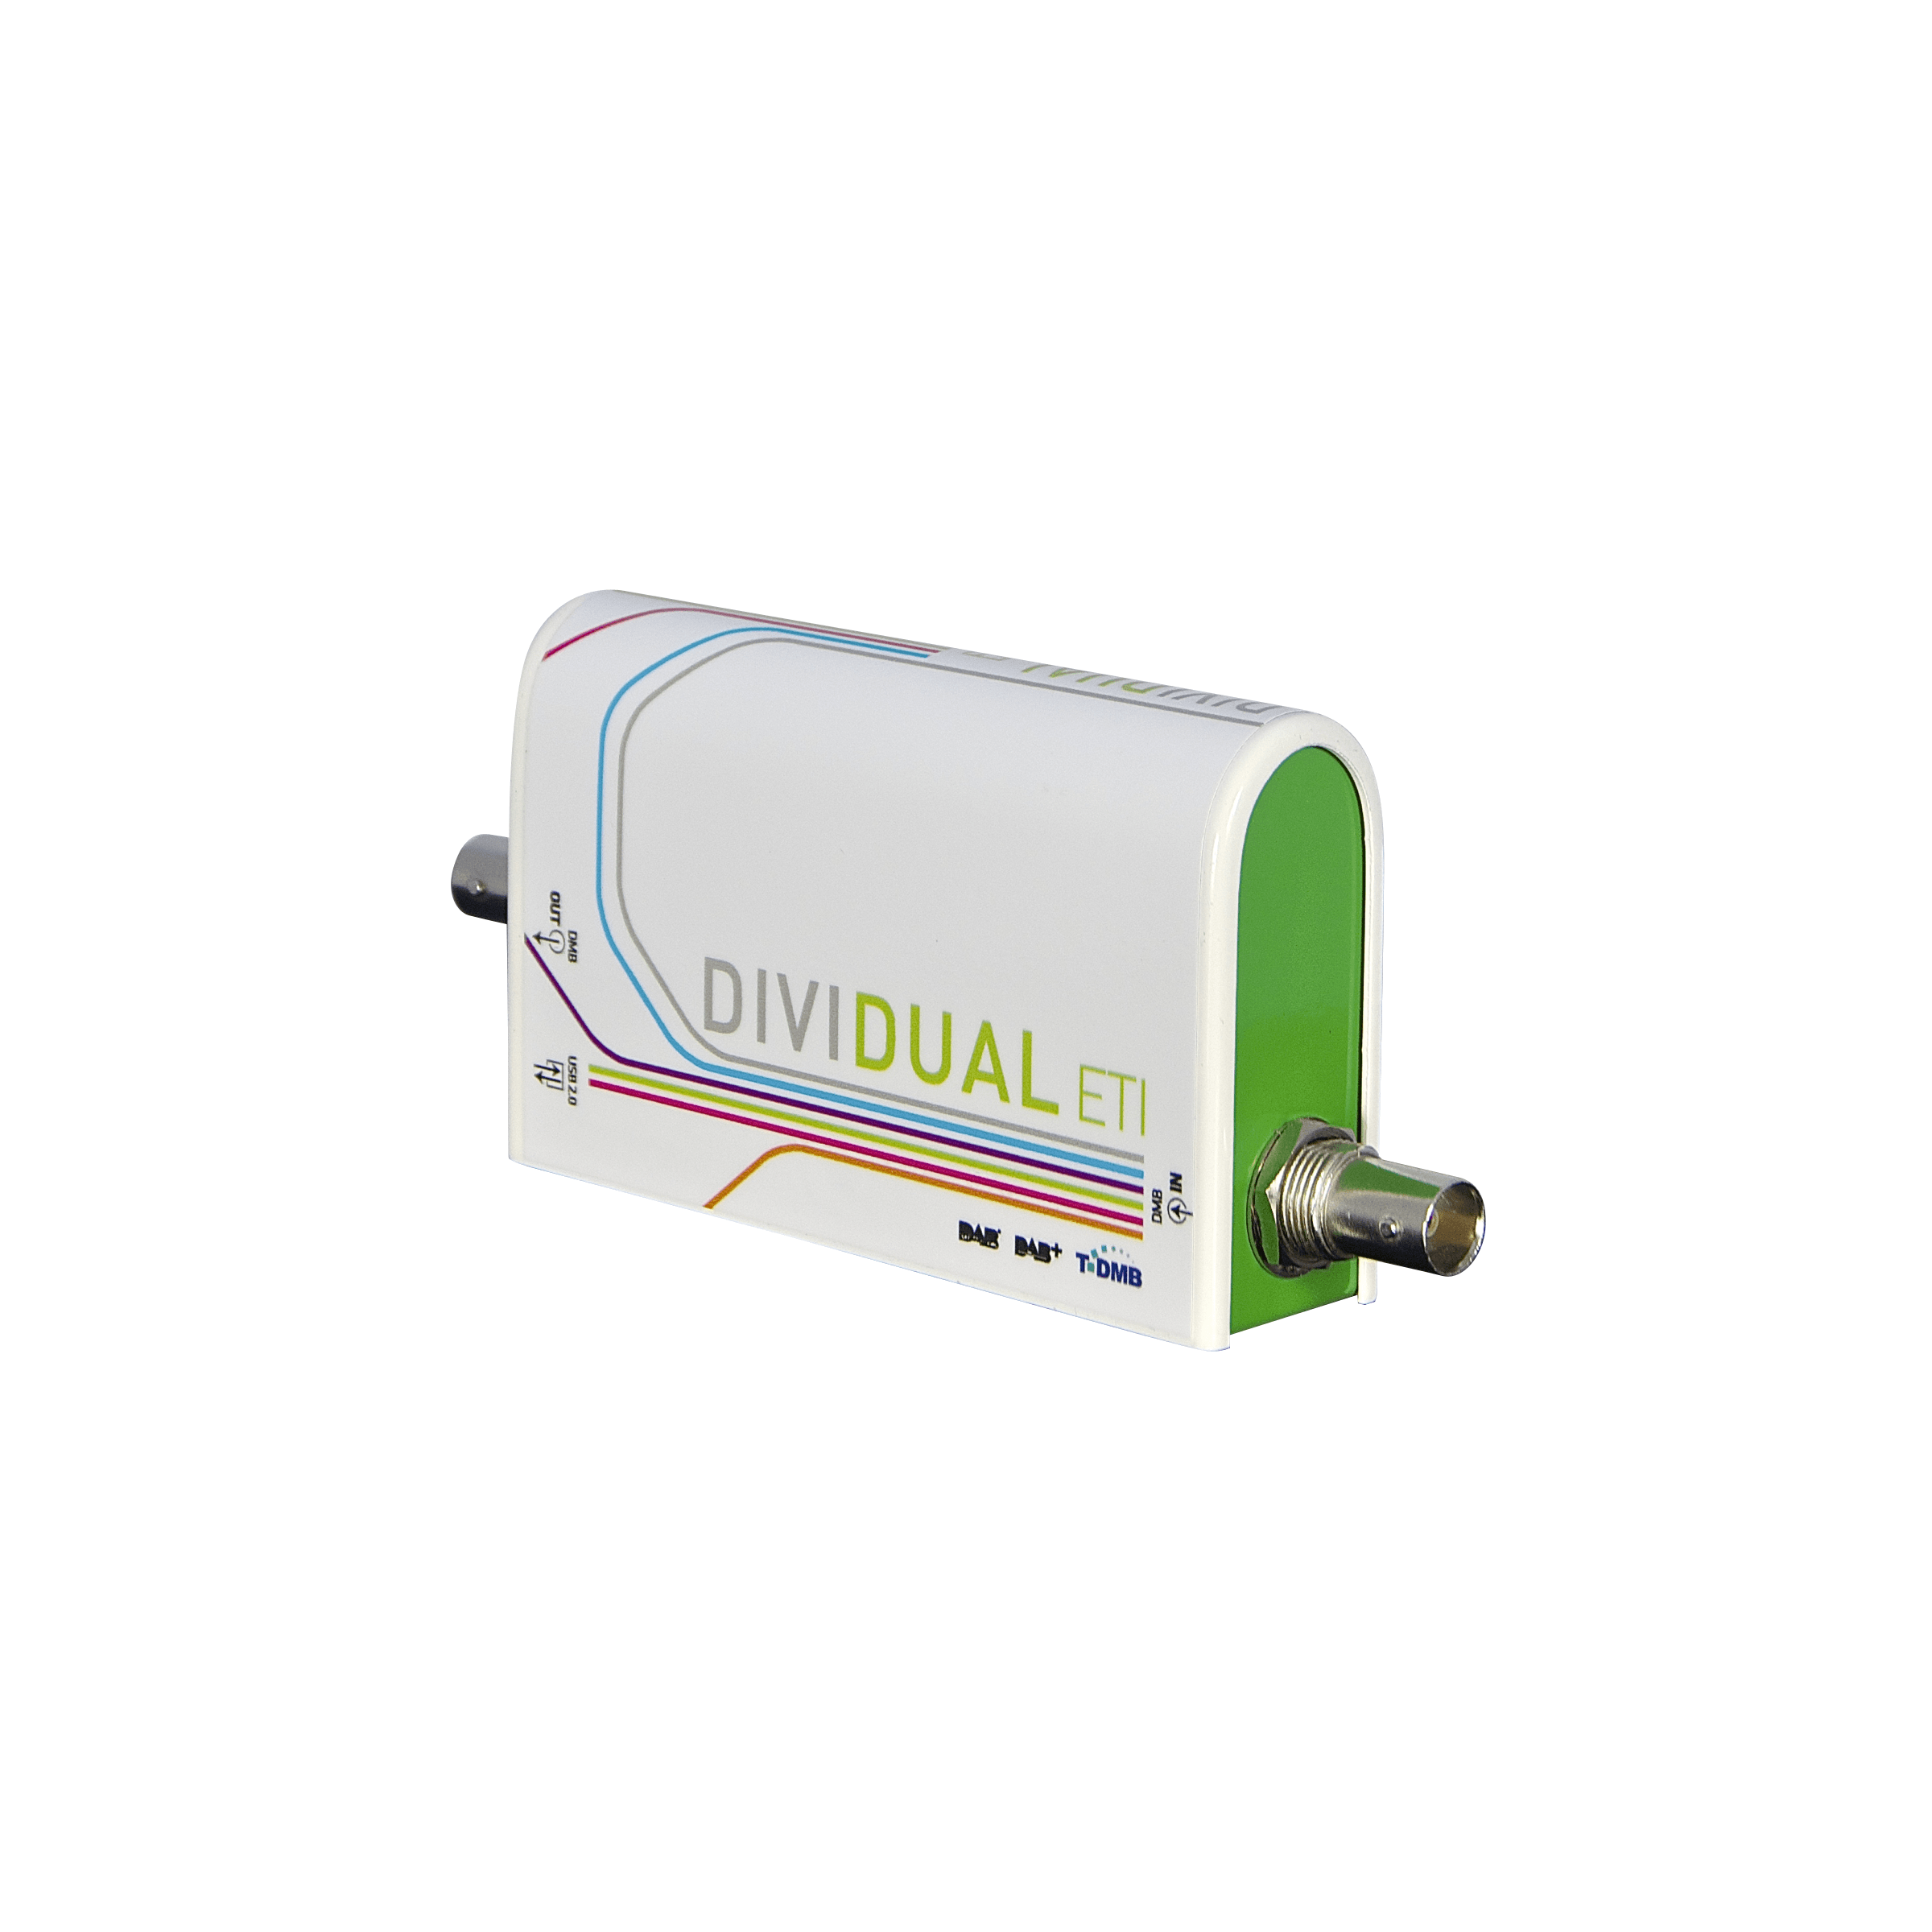 DiviDual ETI – Baseband ETI Recorder & Player